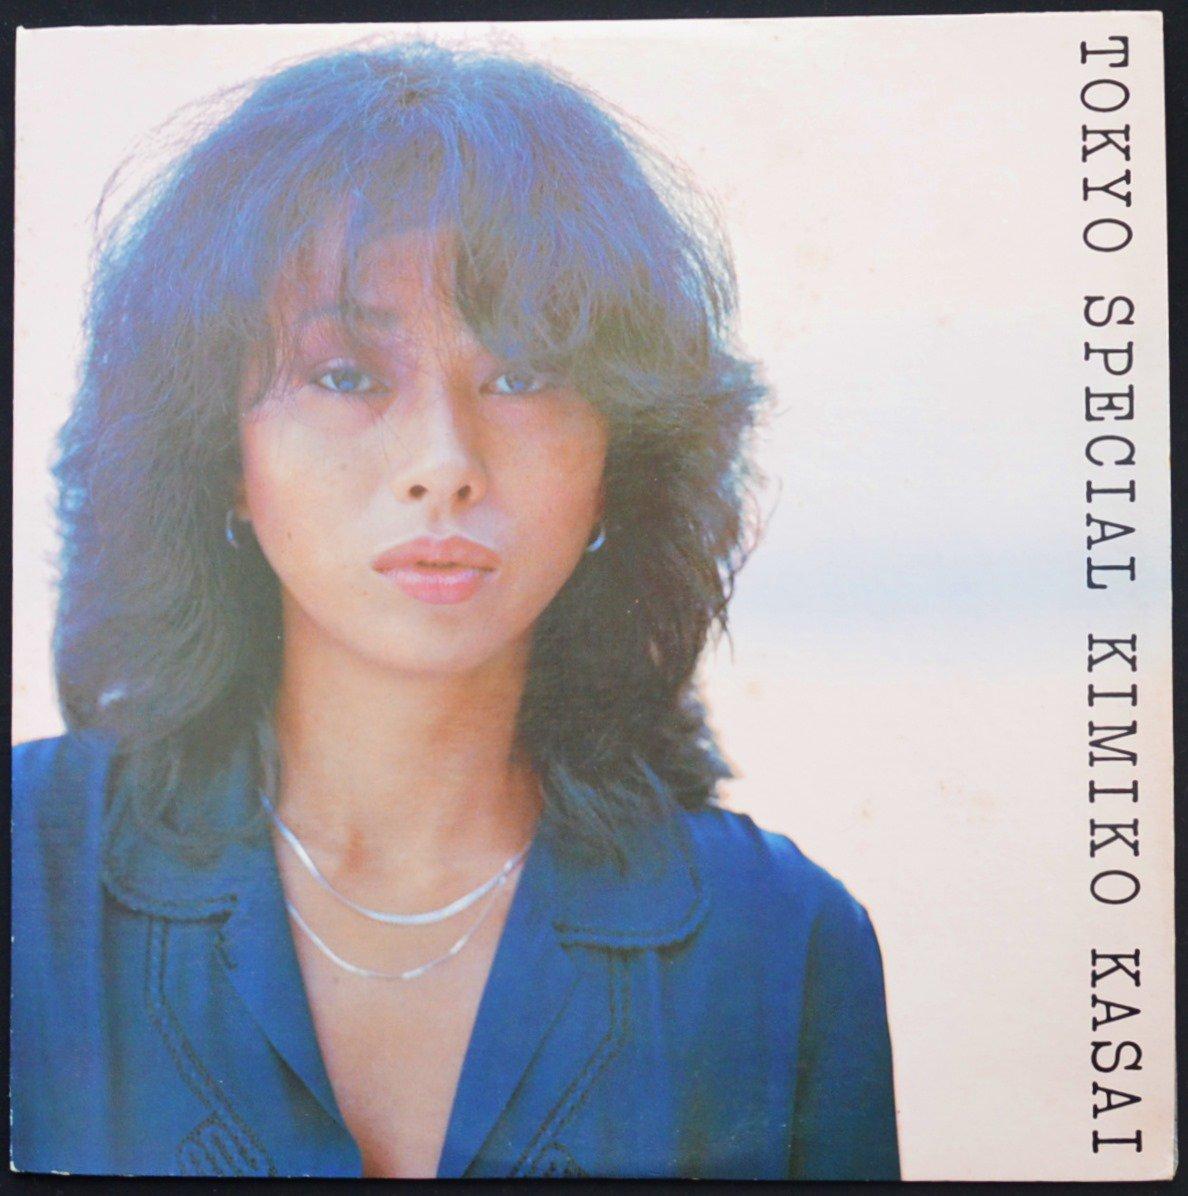 笠井紀美子 KIMIKO KASAI / TOKYO SPECIAL (LP)